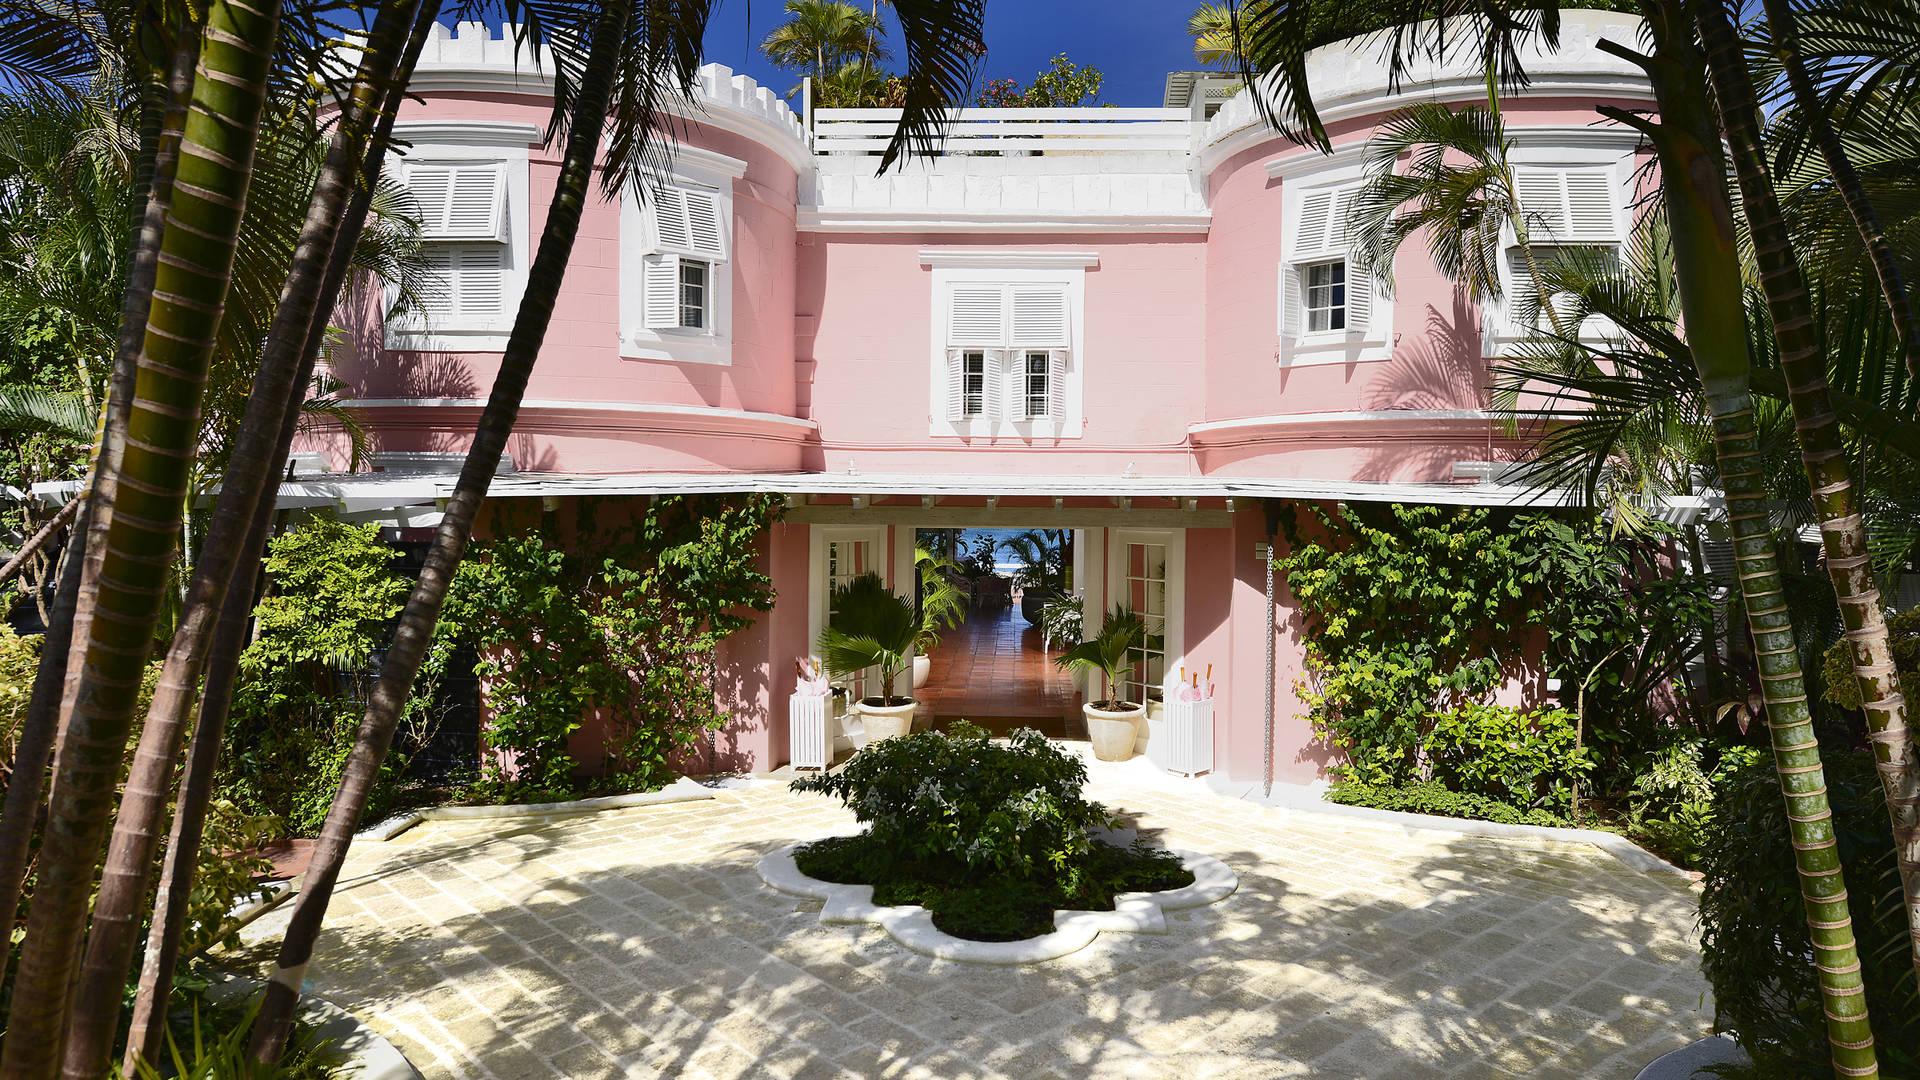 Cobblers+Cove+Great+House.jpeg